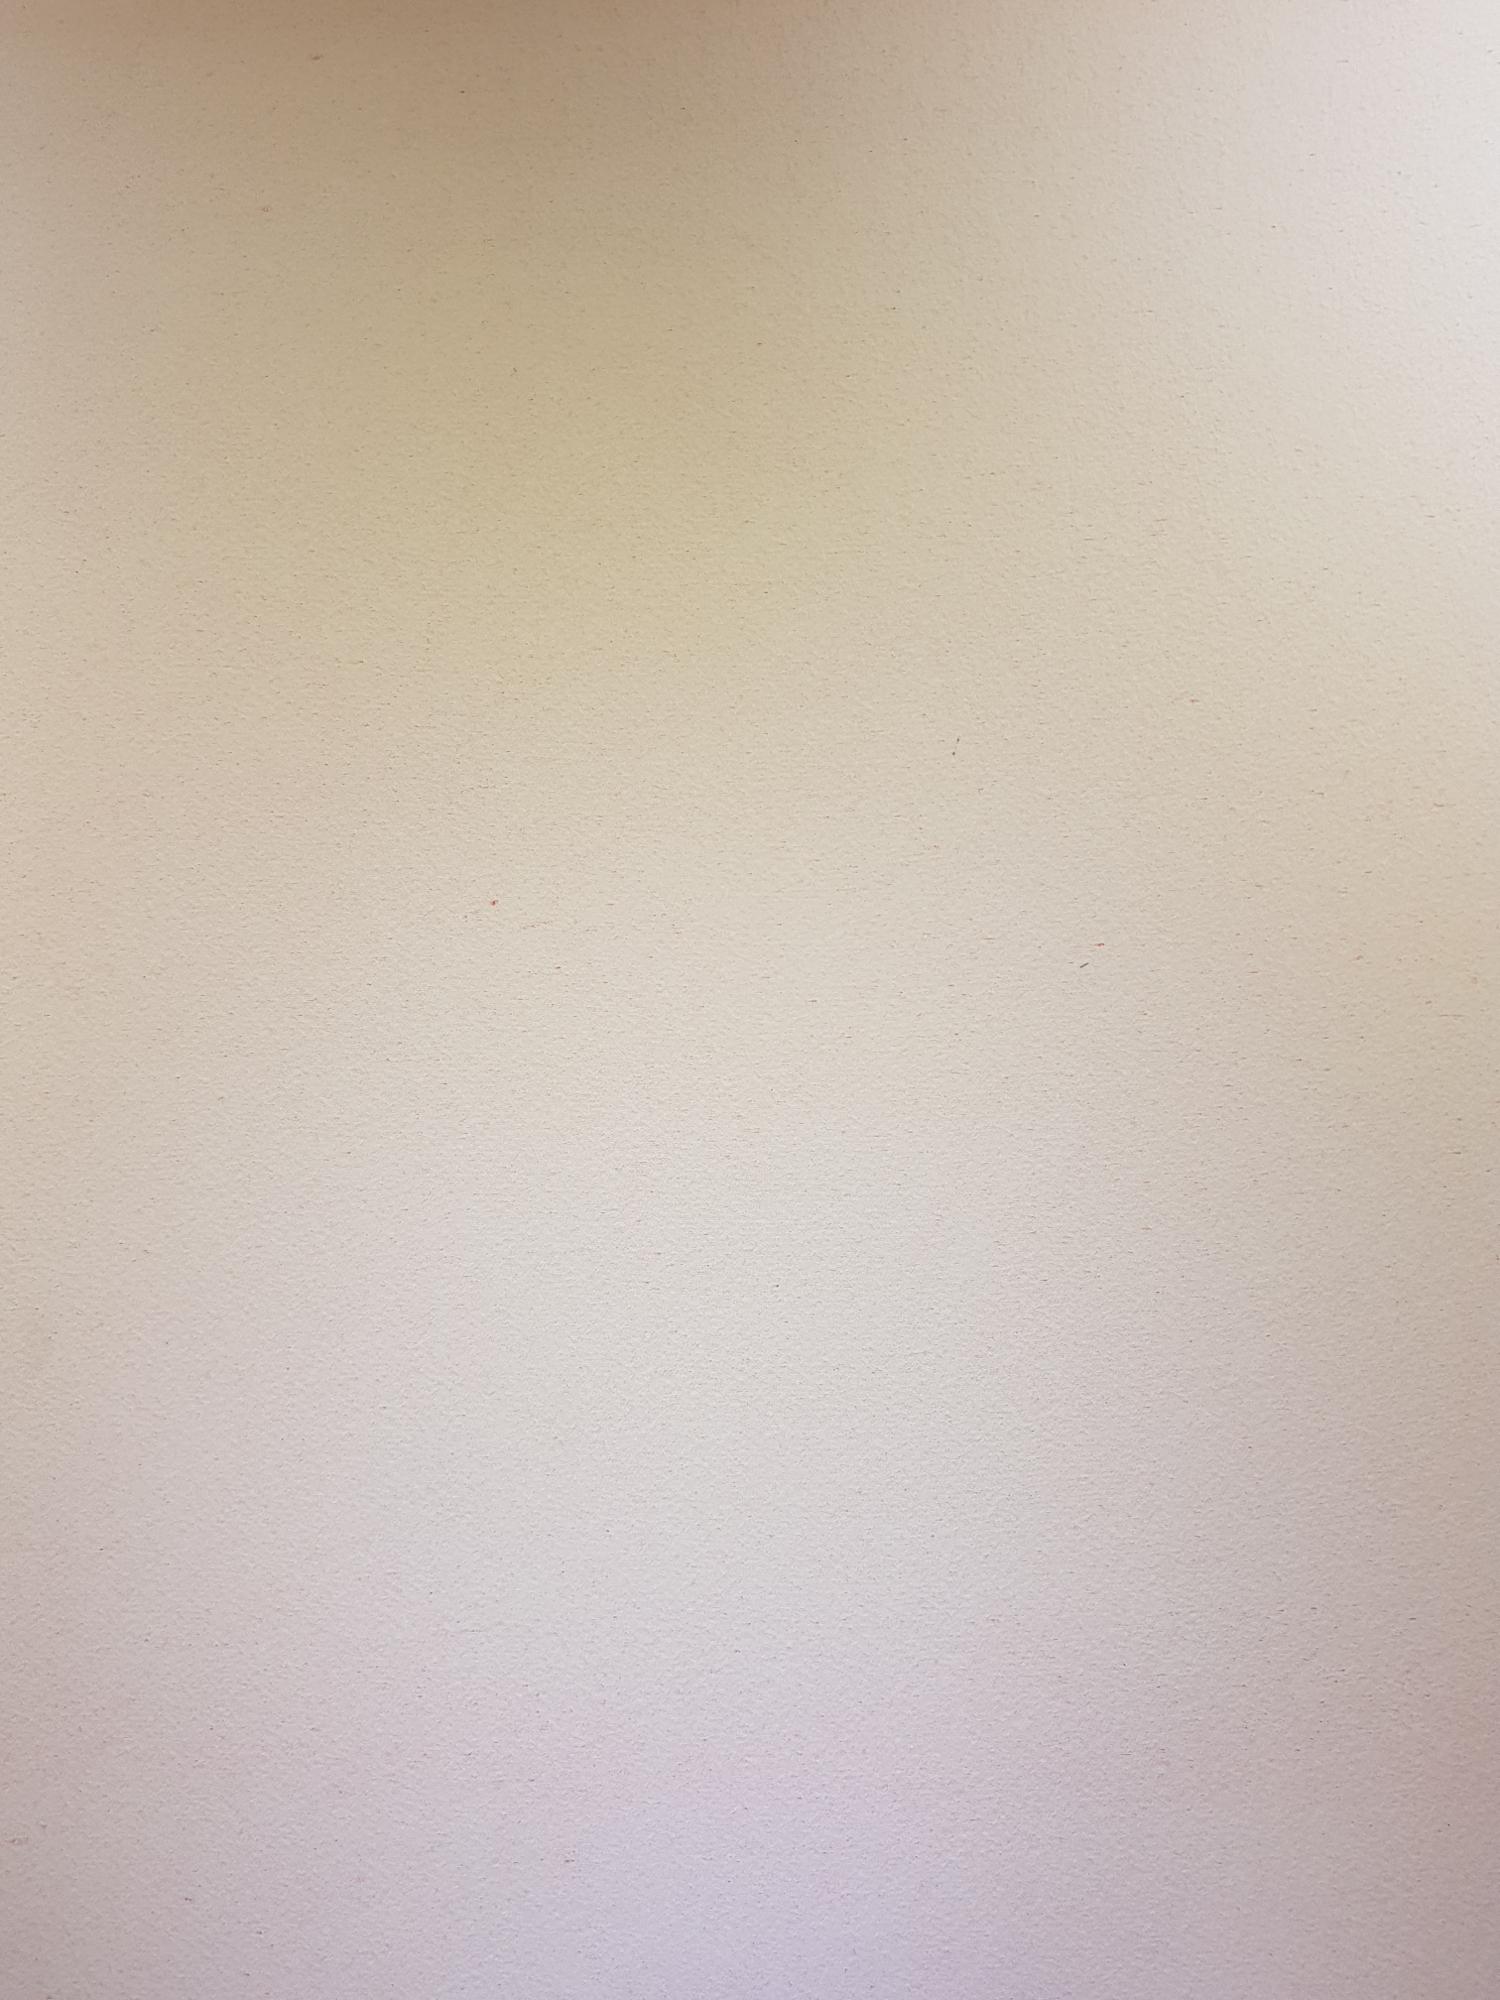 Оборот. Янкилевский Владимир Борисович. Без названия №4. Из цикла Женщина у моря